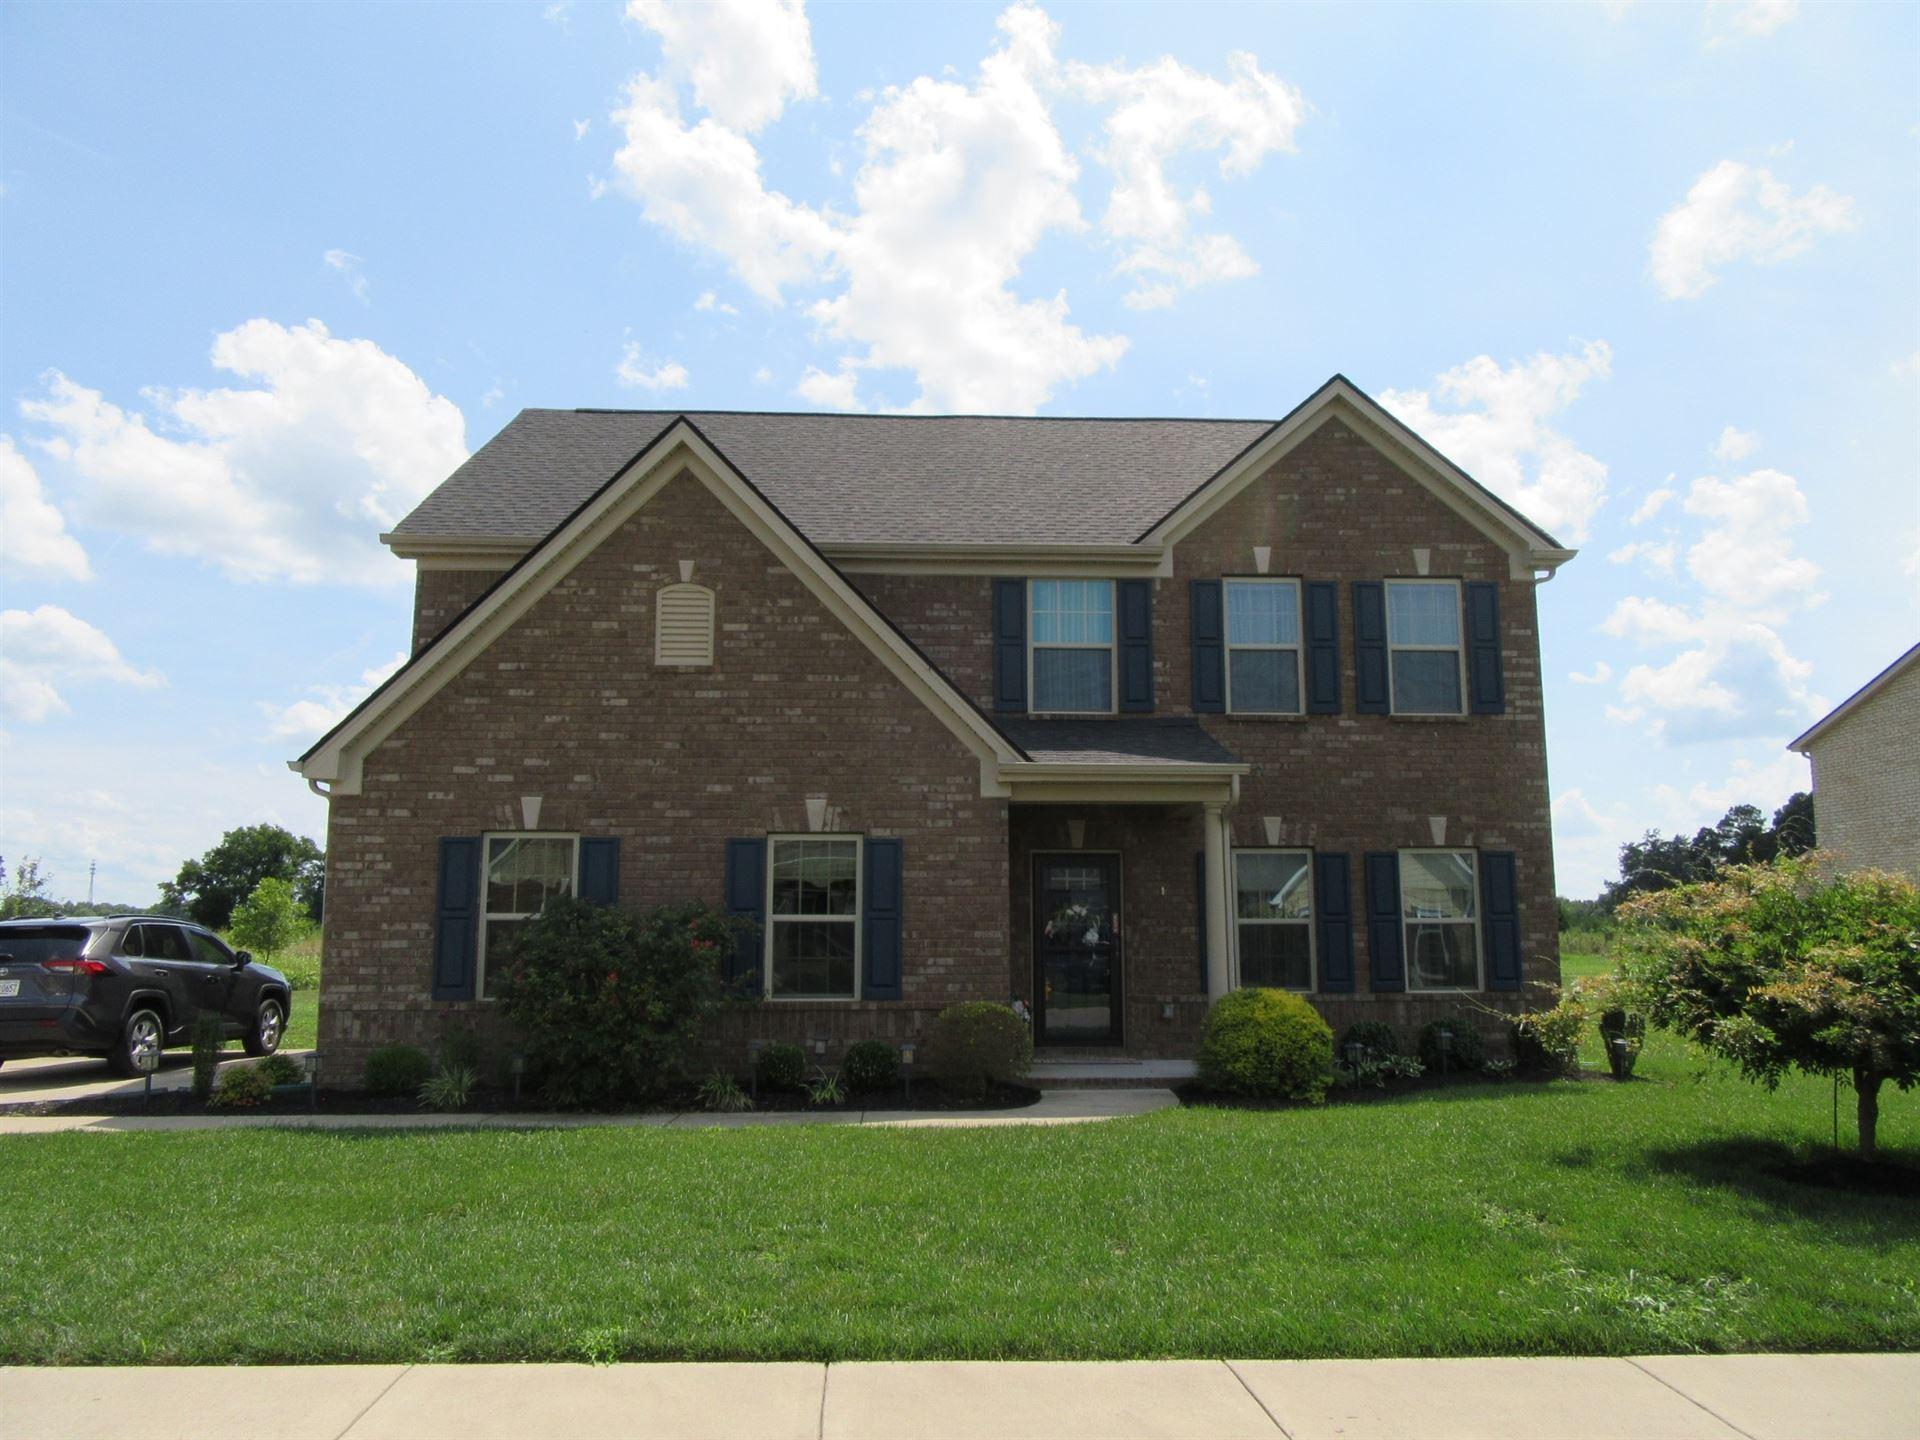 1410 Oak Dr, Murfreesboro, TN 37128 - MLS#: 2293191